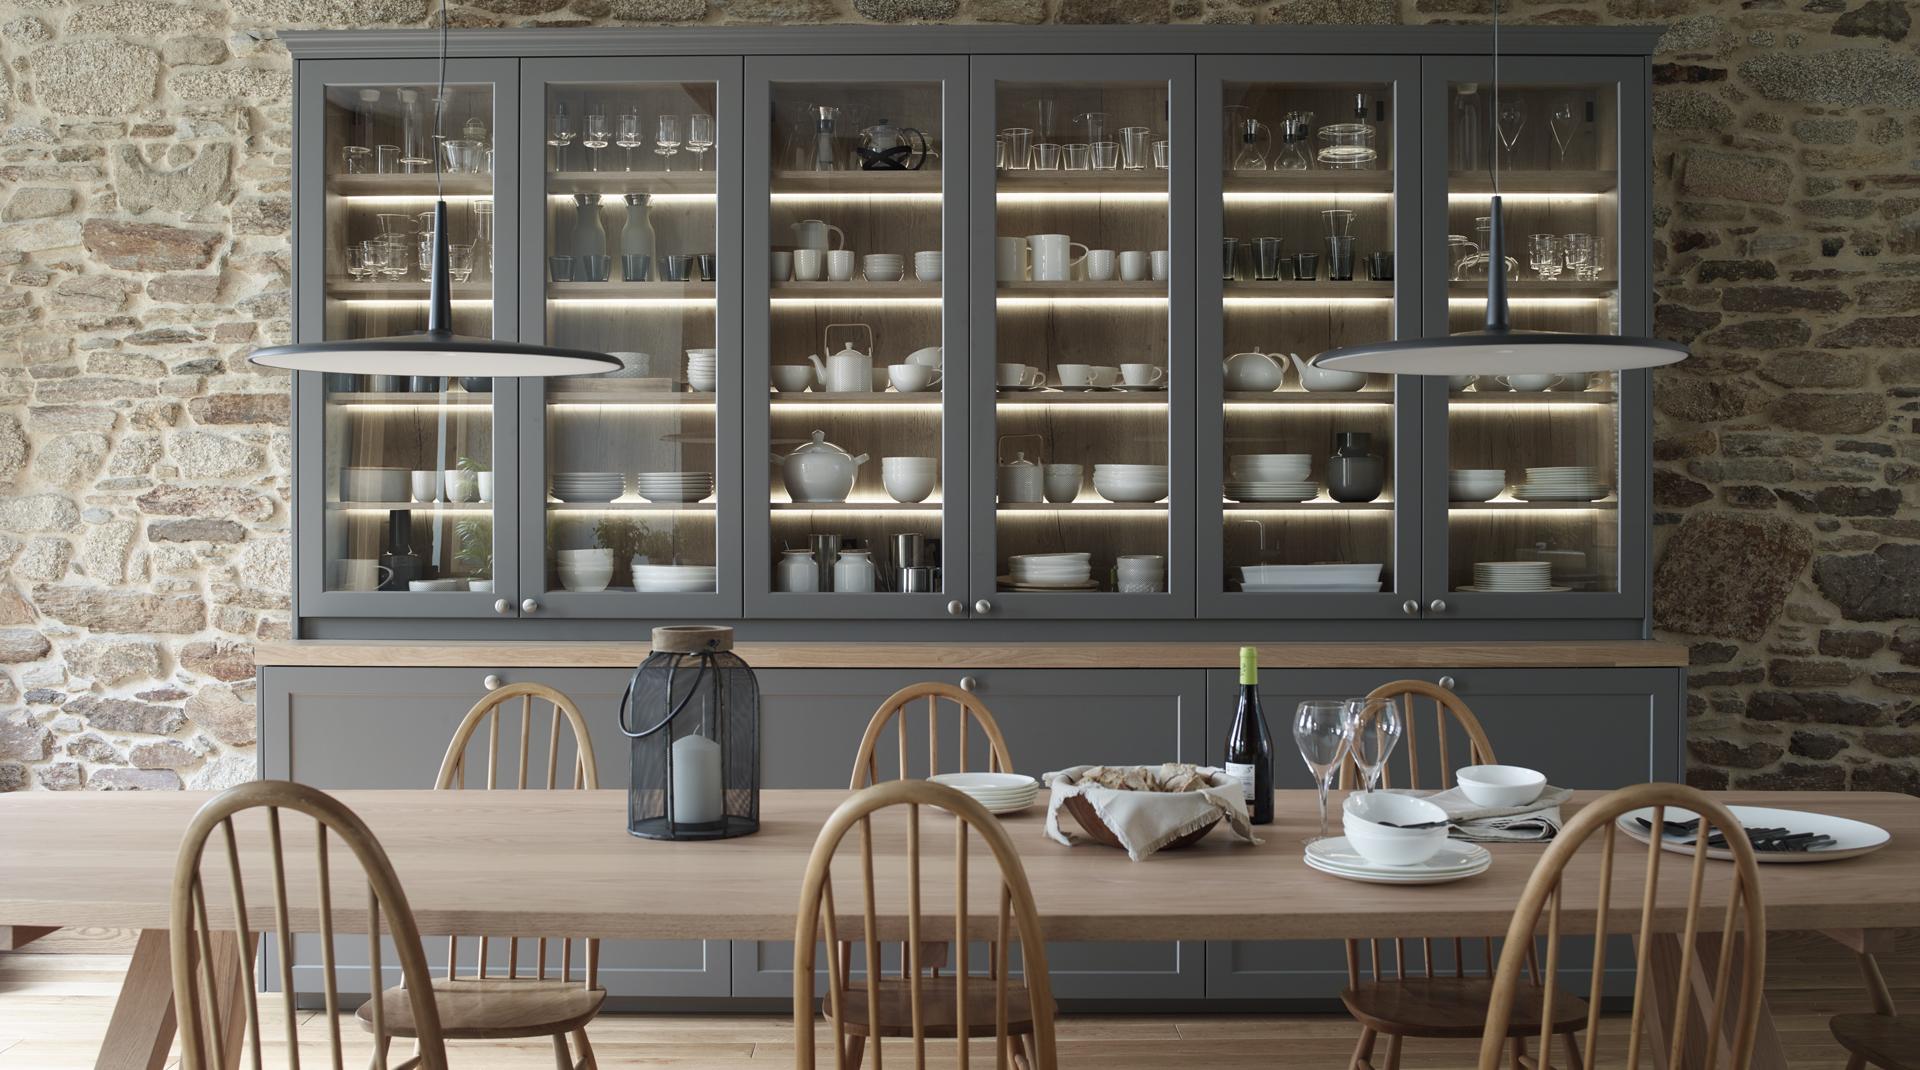 Aparador con vitrina en cocina grande con isla Santiago Interiores